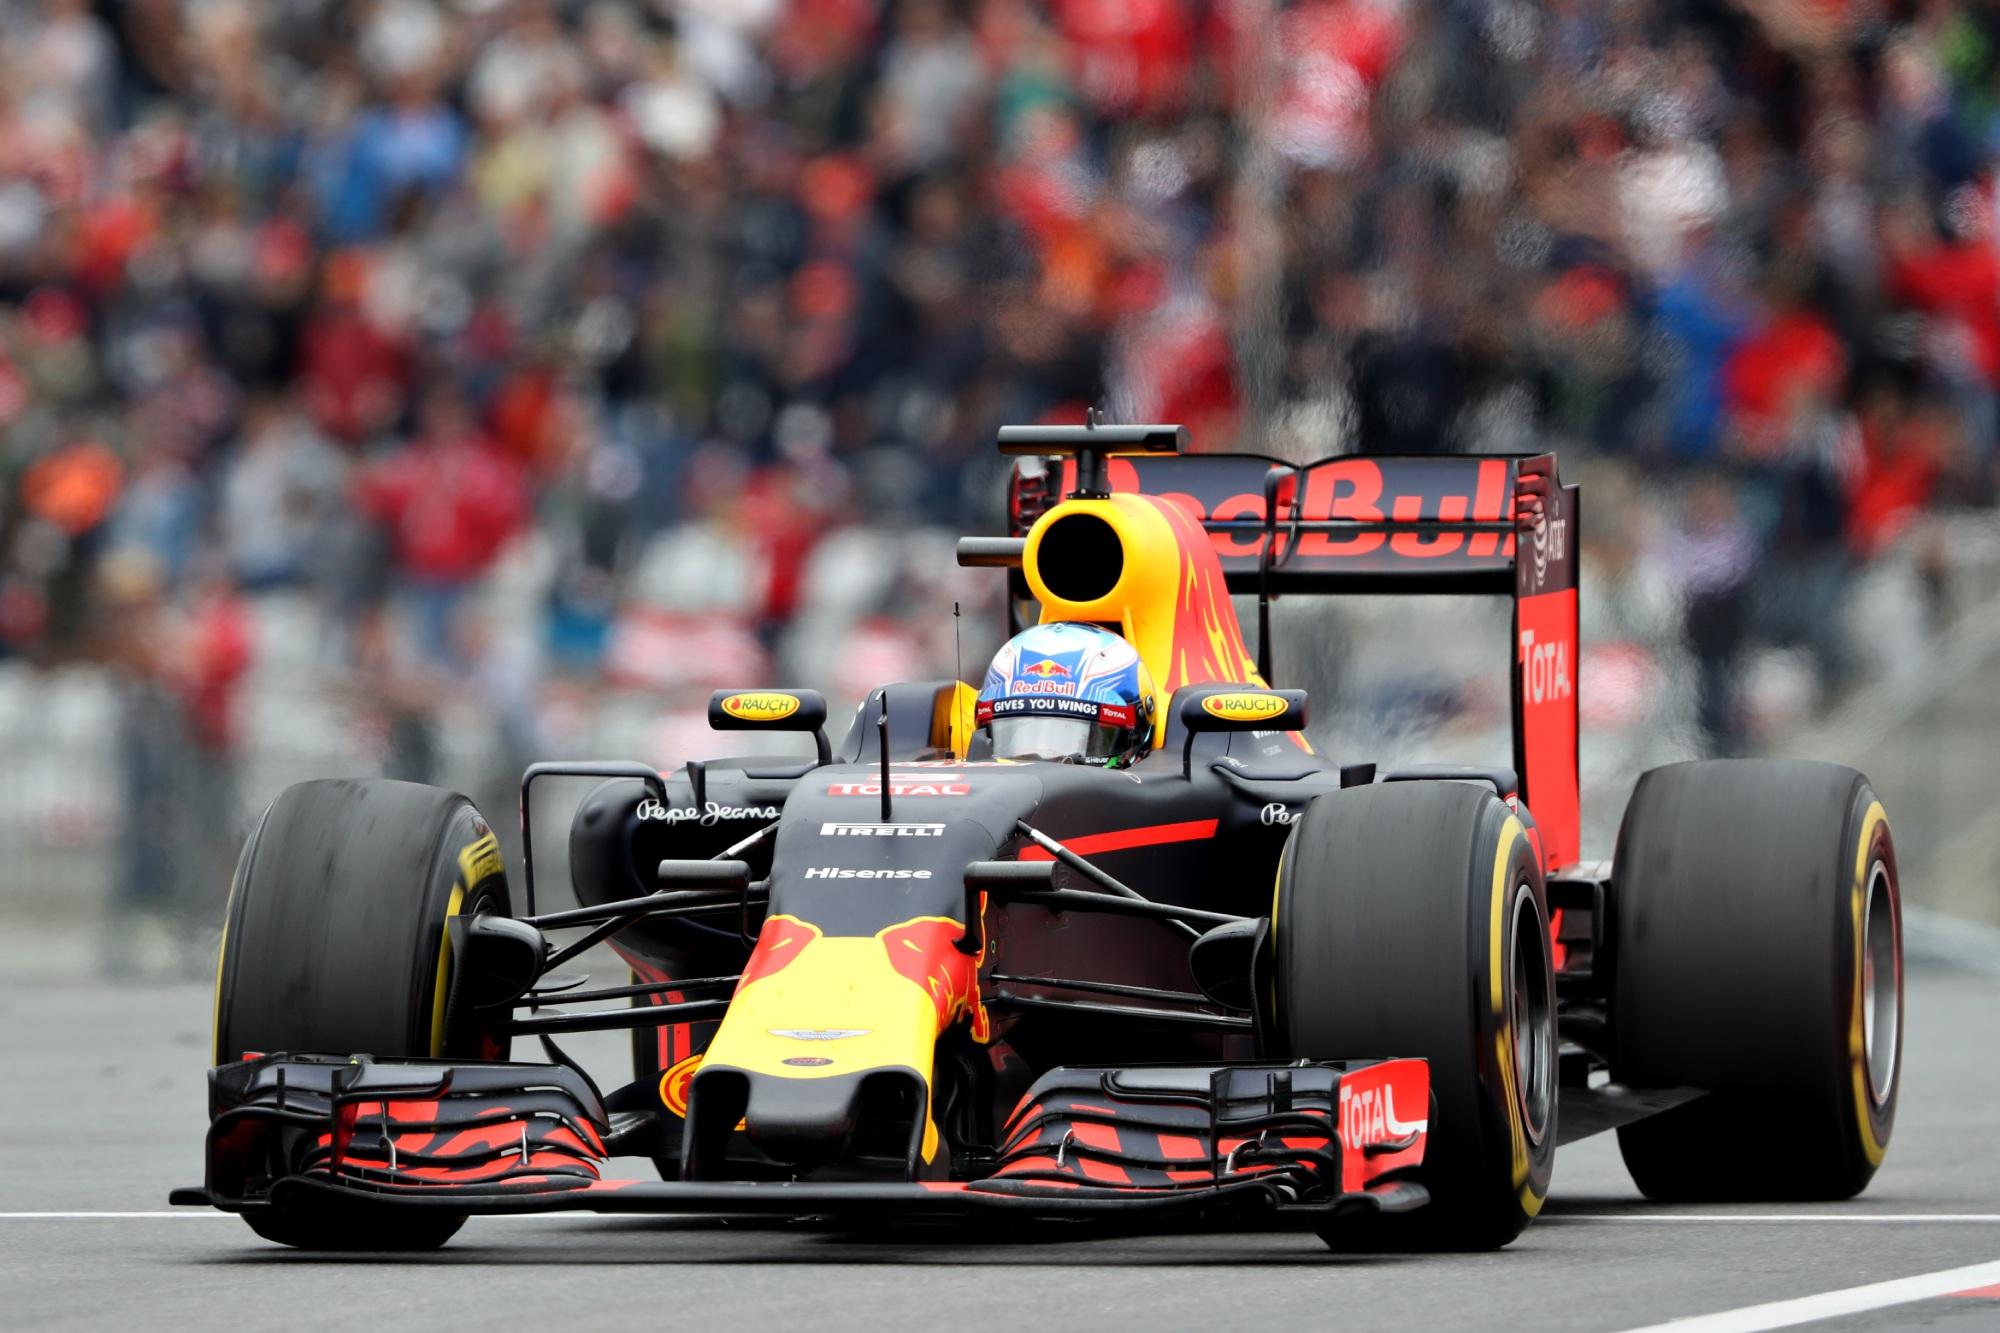 Austrian F1 GP: Ricciardo fifth as Hamilton claims win